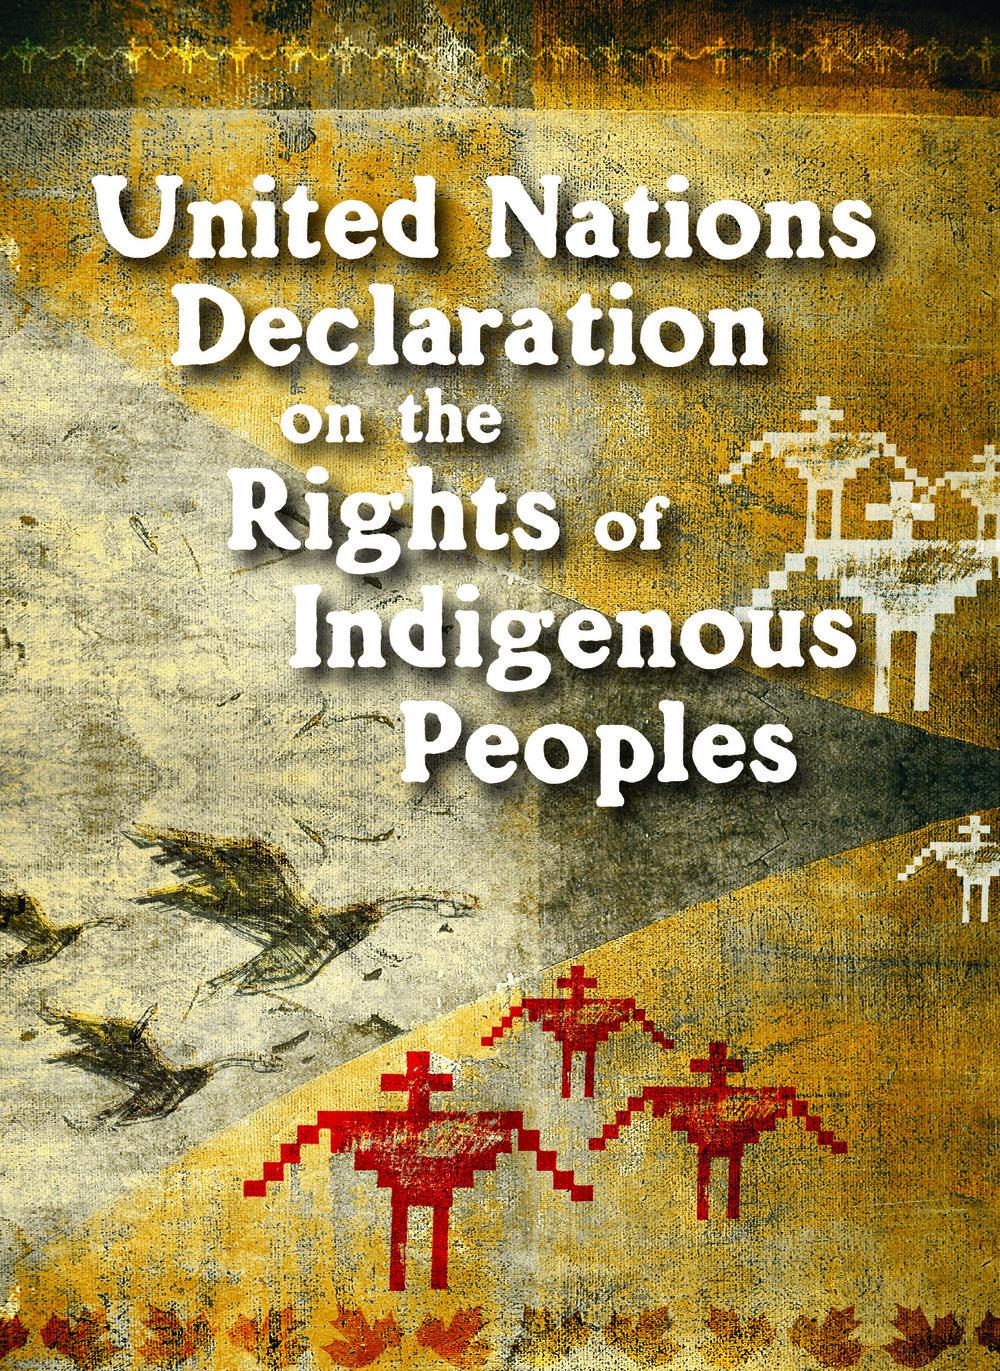 UN Declaration cover.jpg